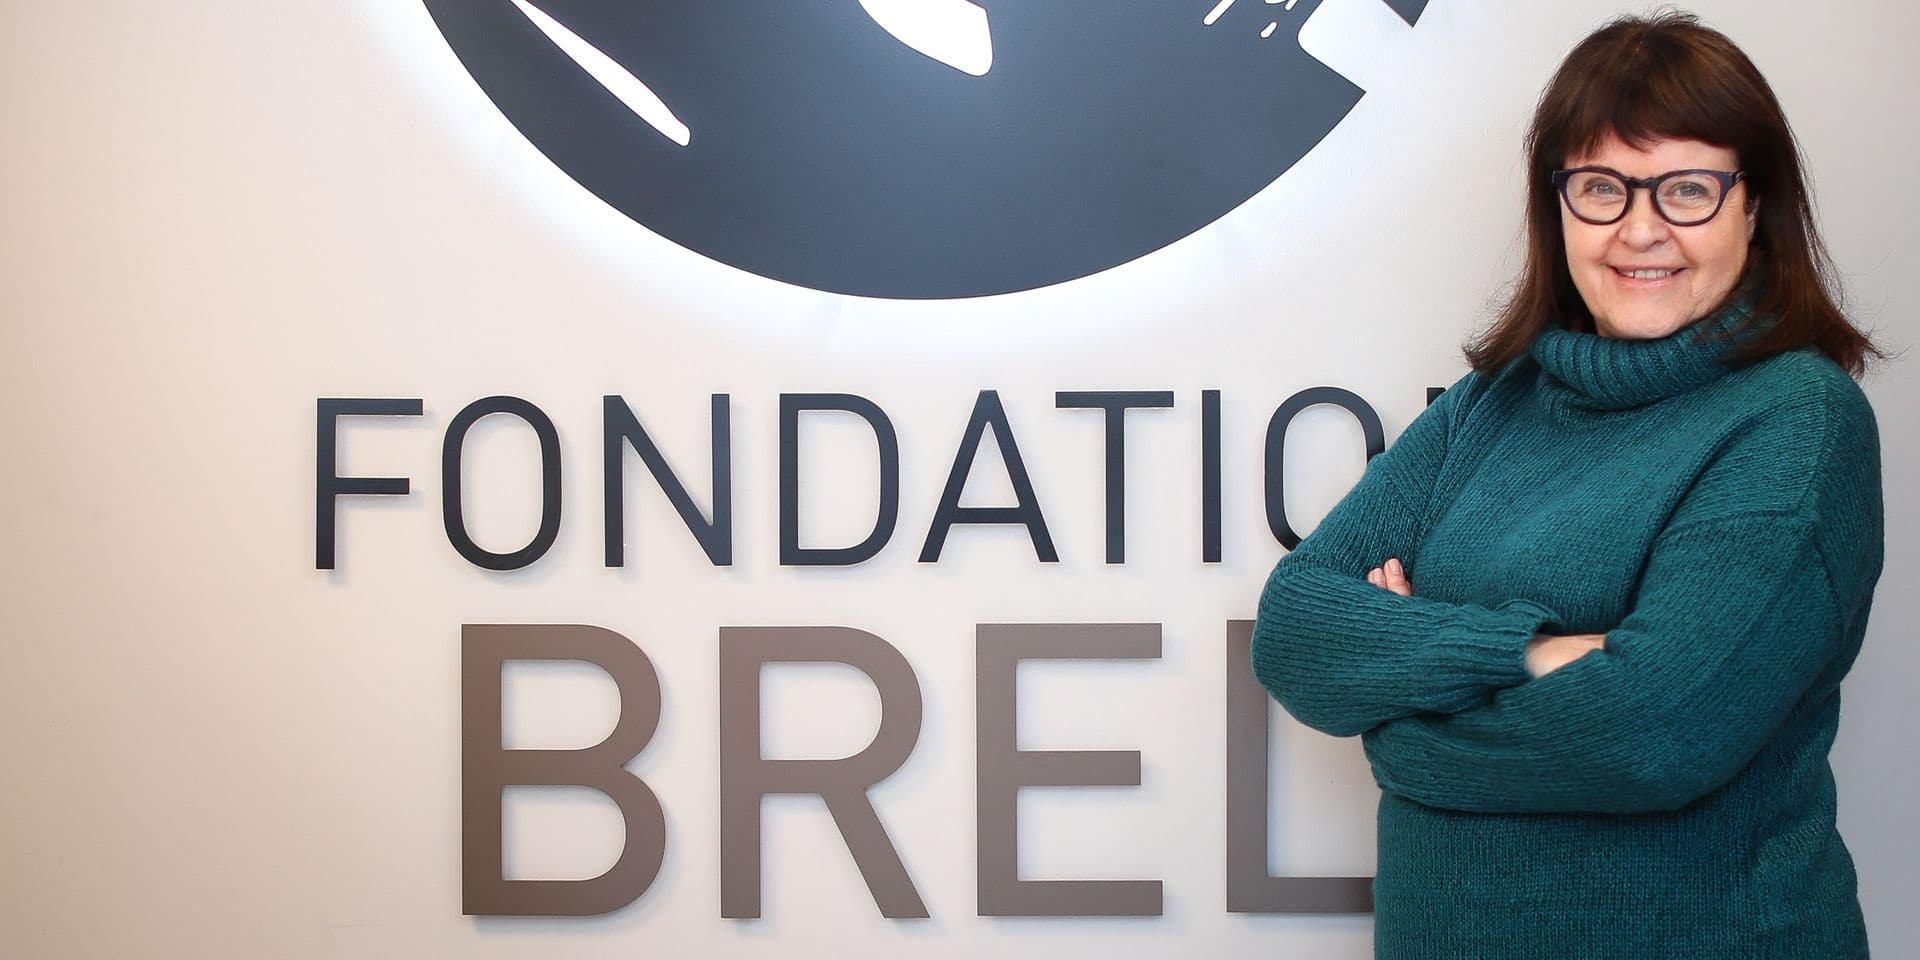 Photos Bernard Demoulin : France Brel a la fondation Brel